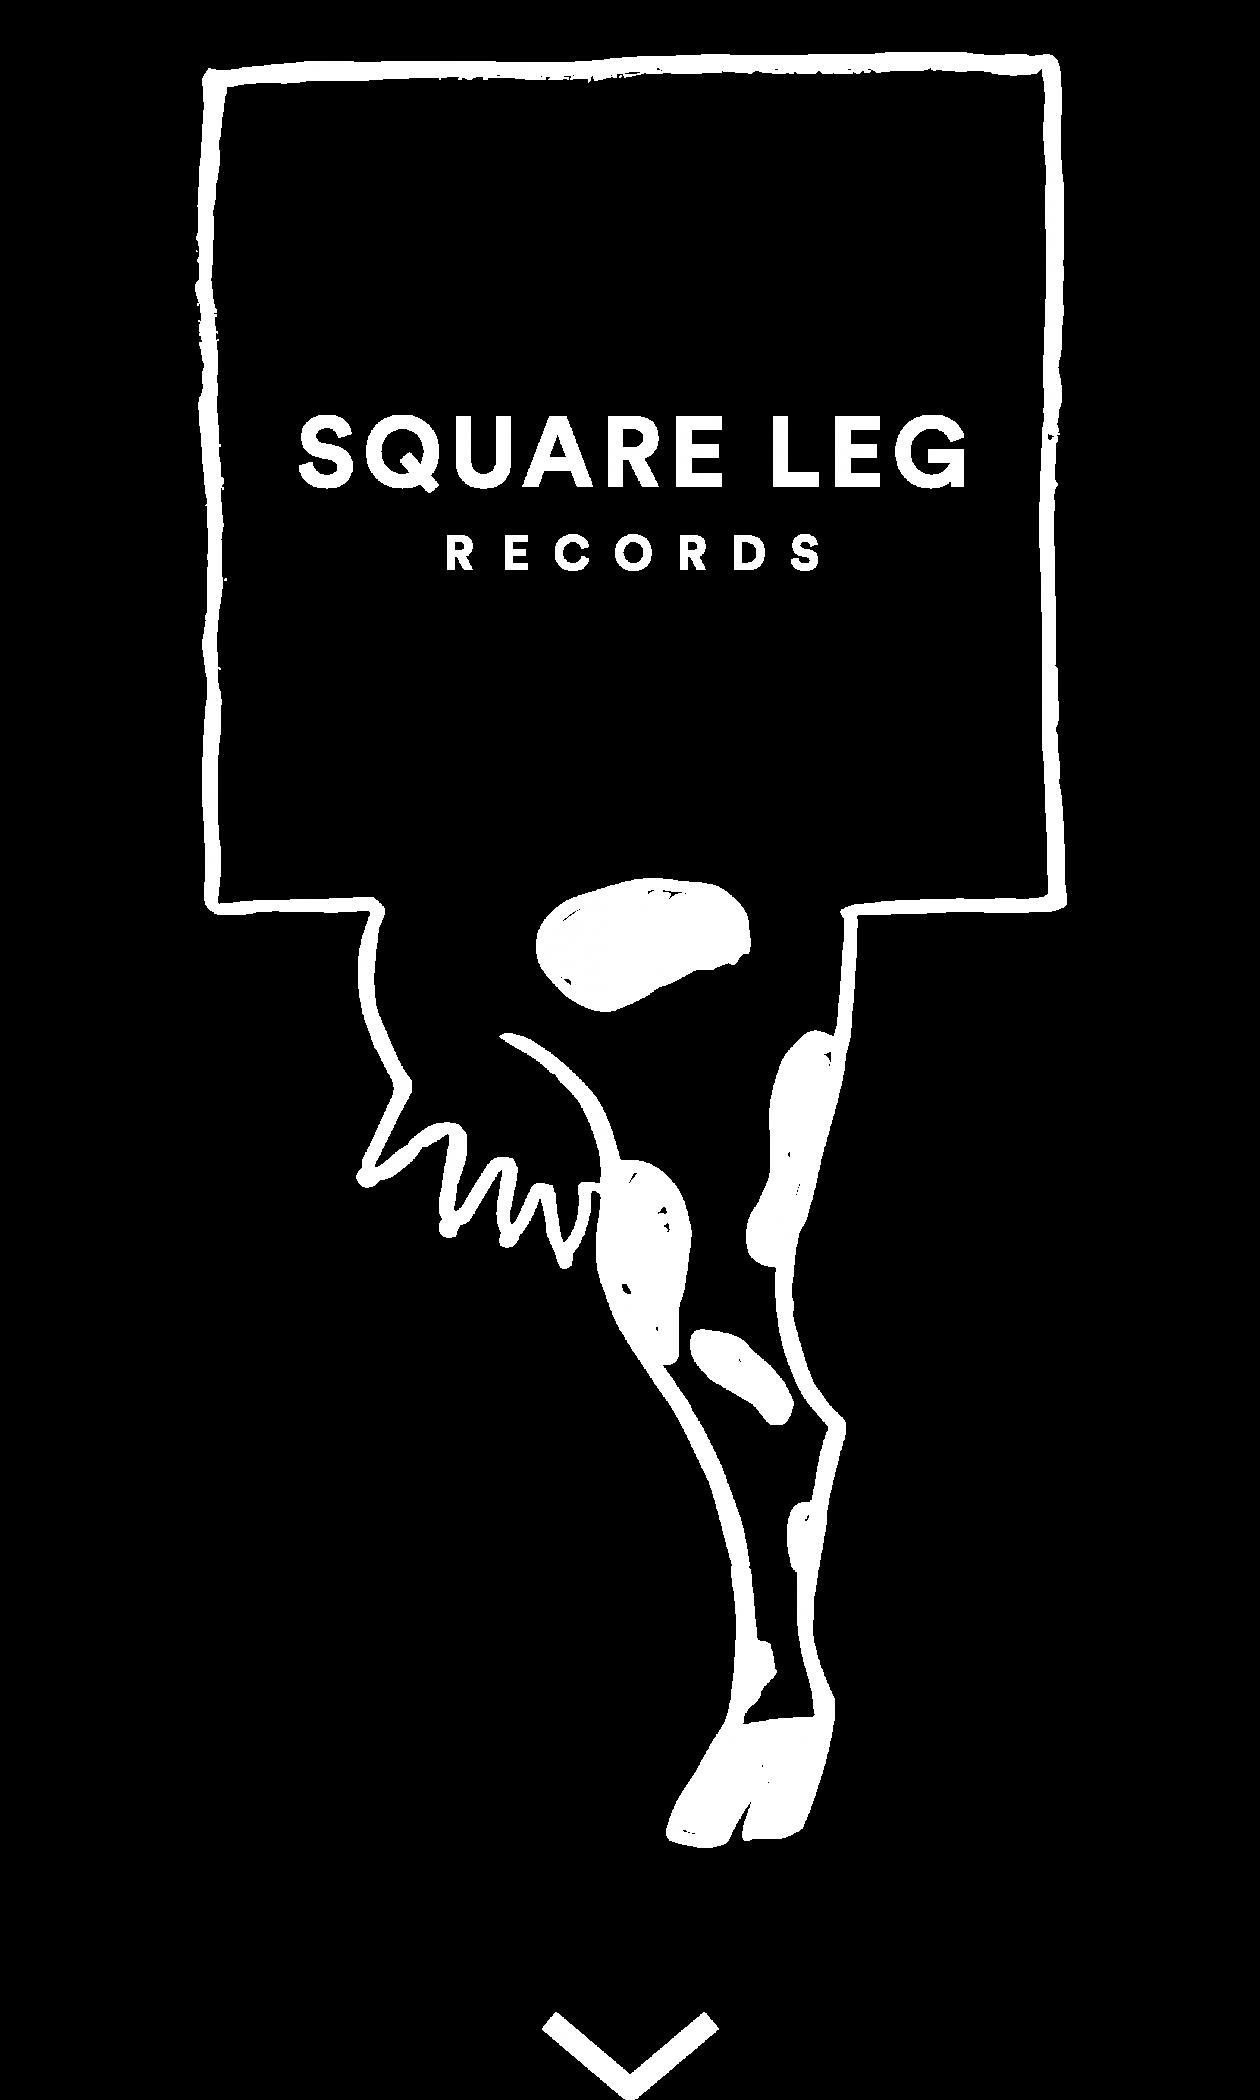 Square Leg Records